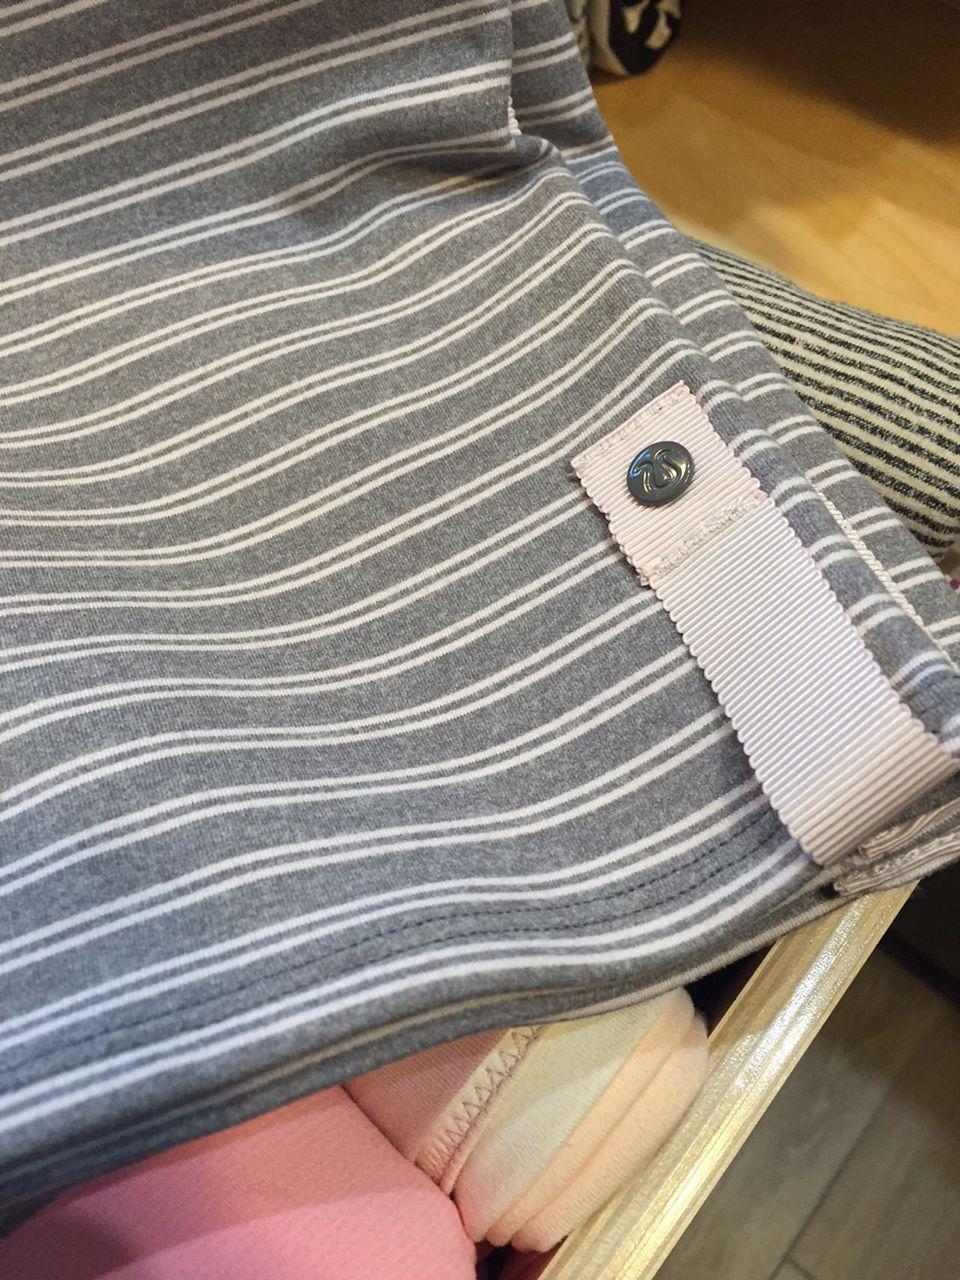 Lululemon Vinyasa Scarf *Rulu - Double Trouble Stripe Neutral Blush Heathered Slate / Heathered Slate